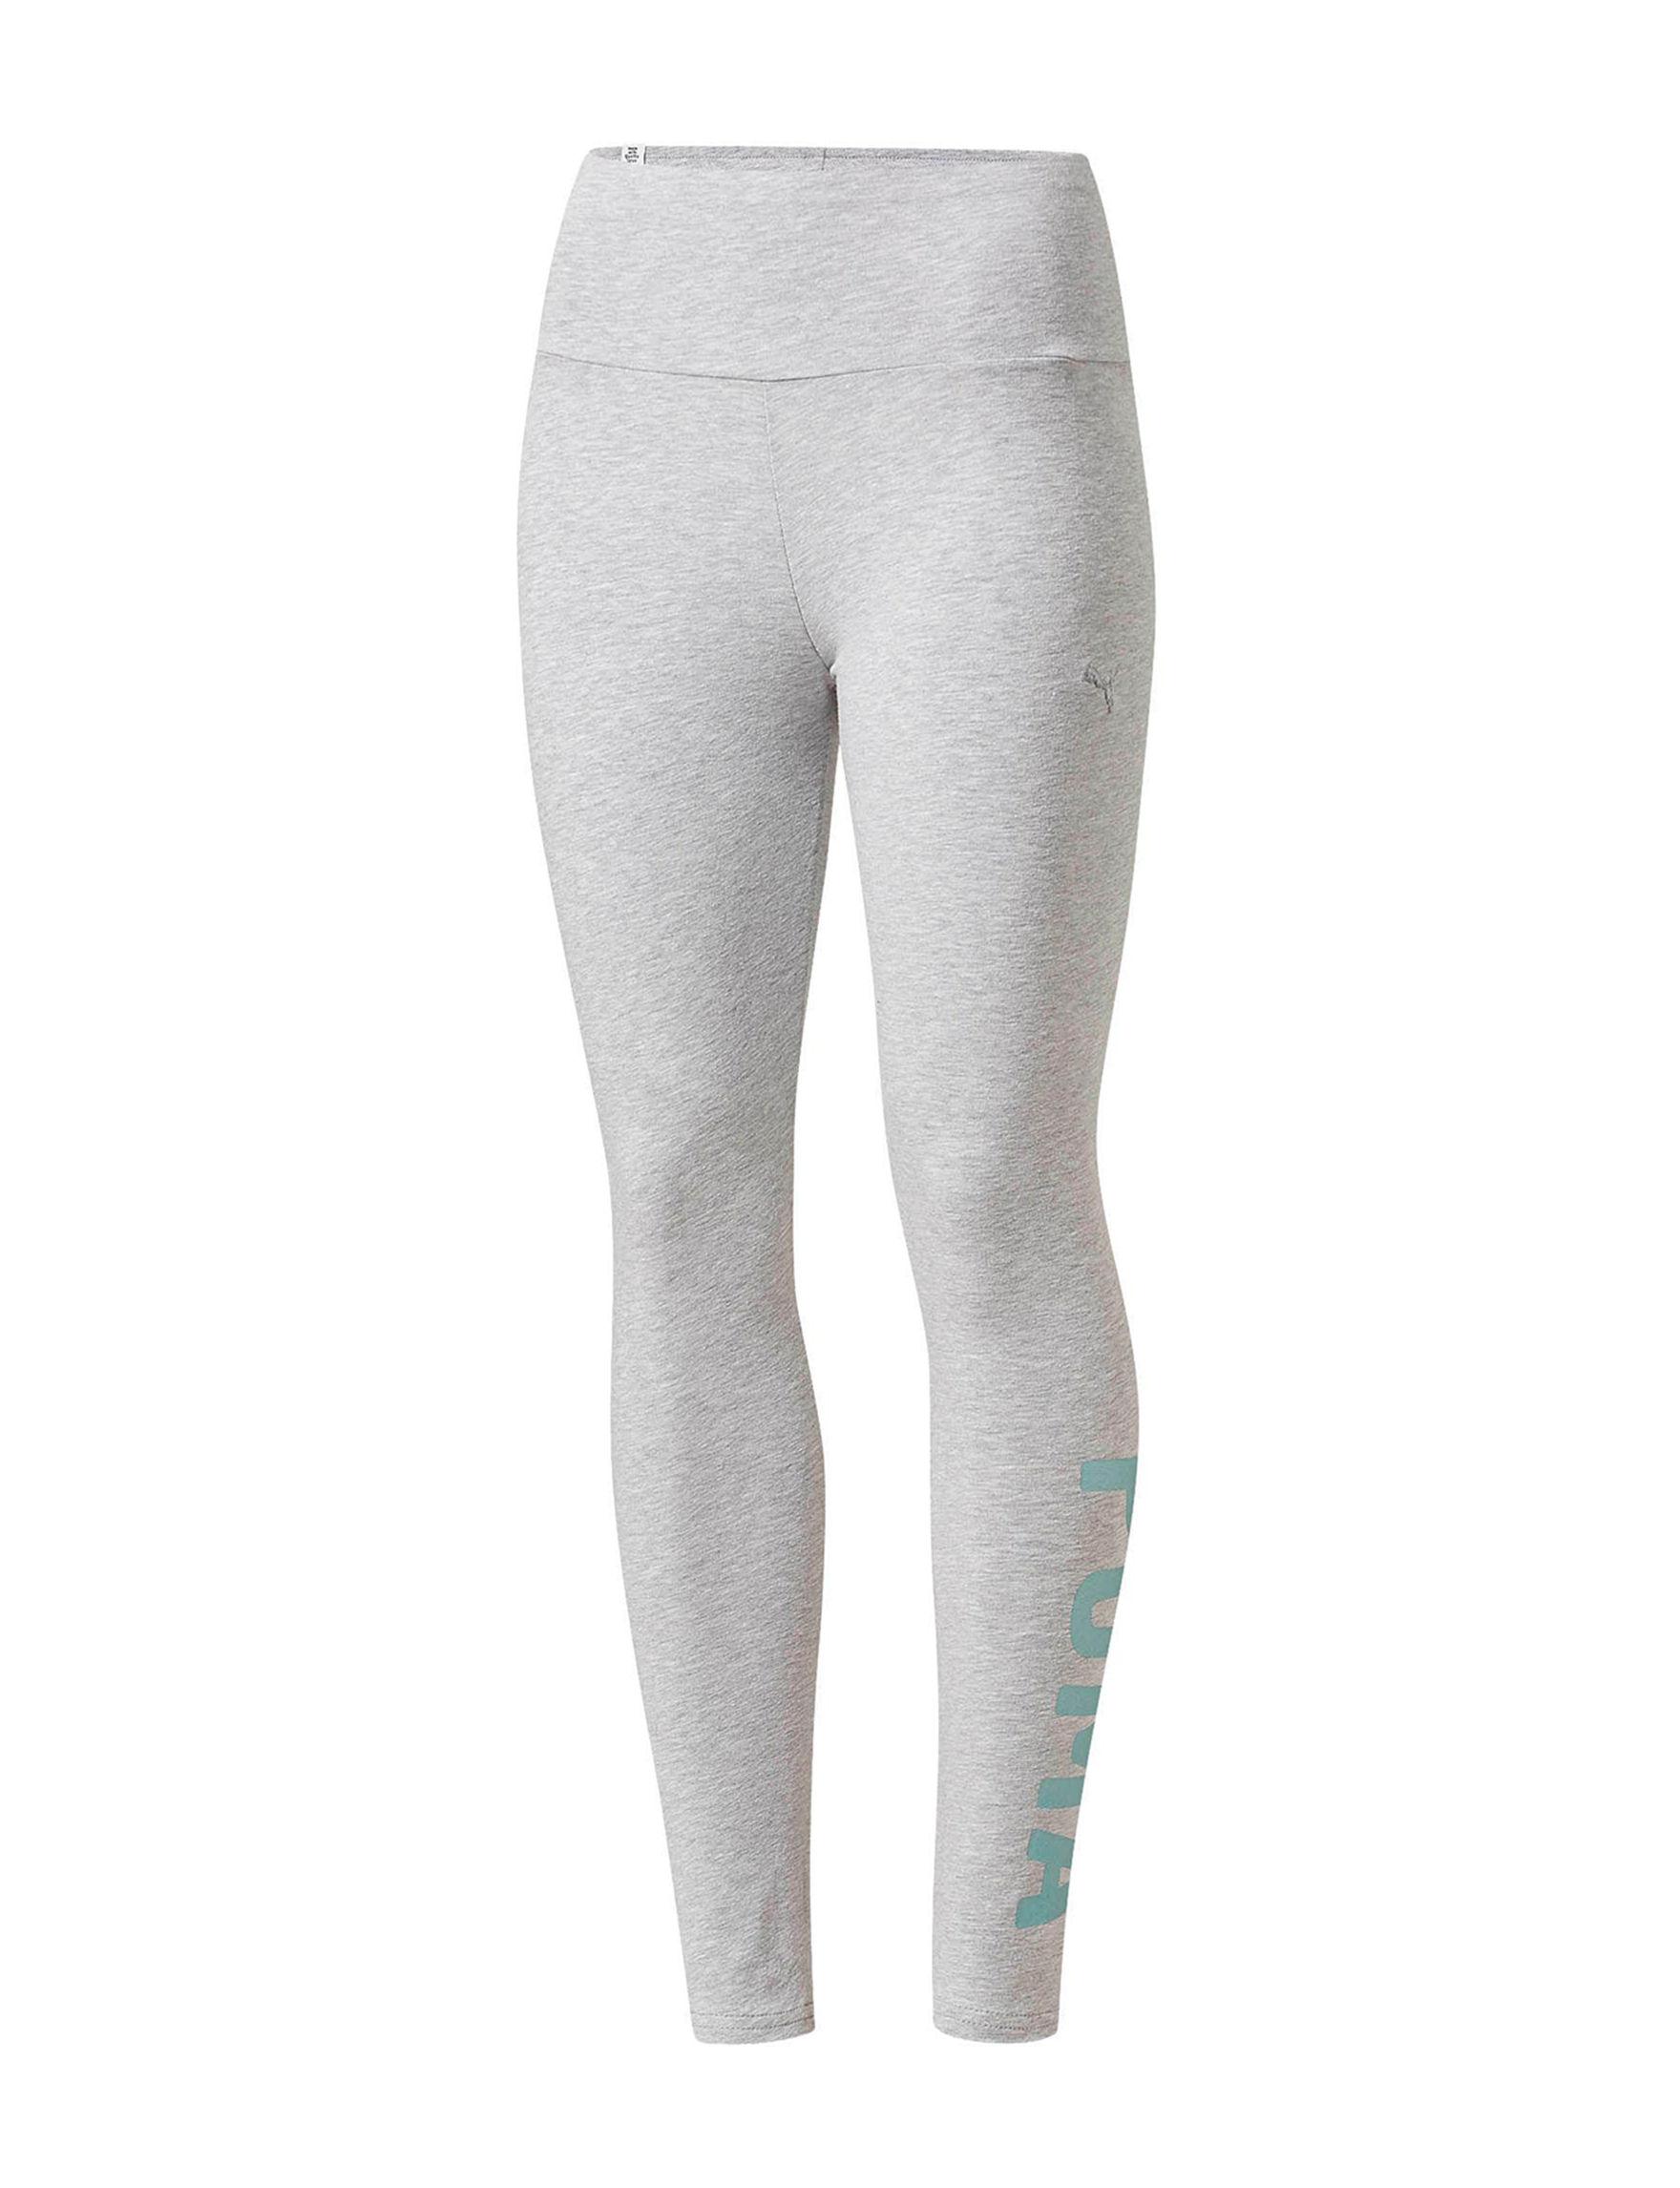 Puma Grey Leggings